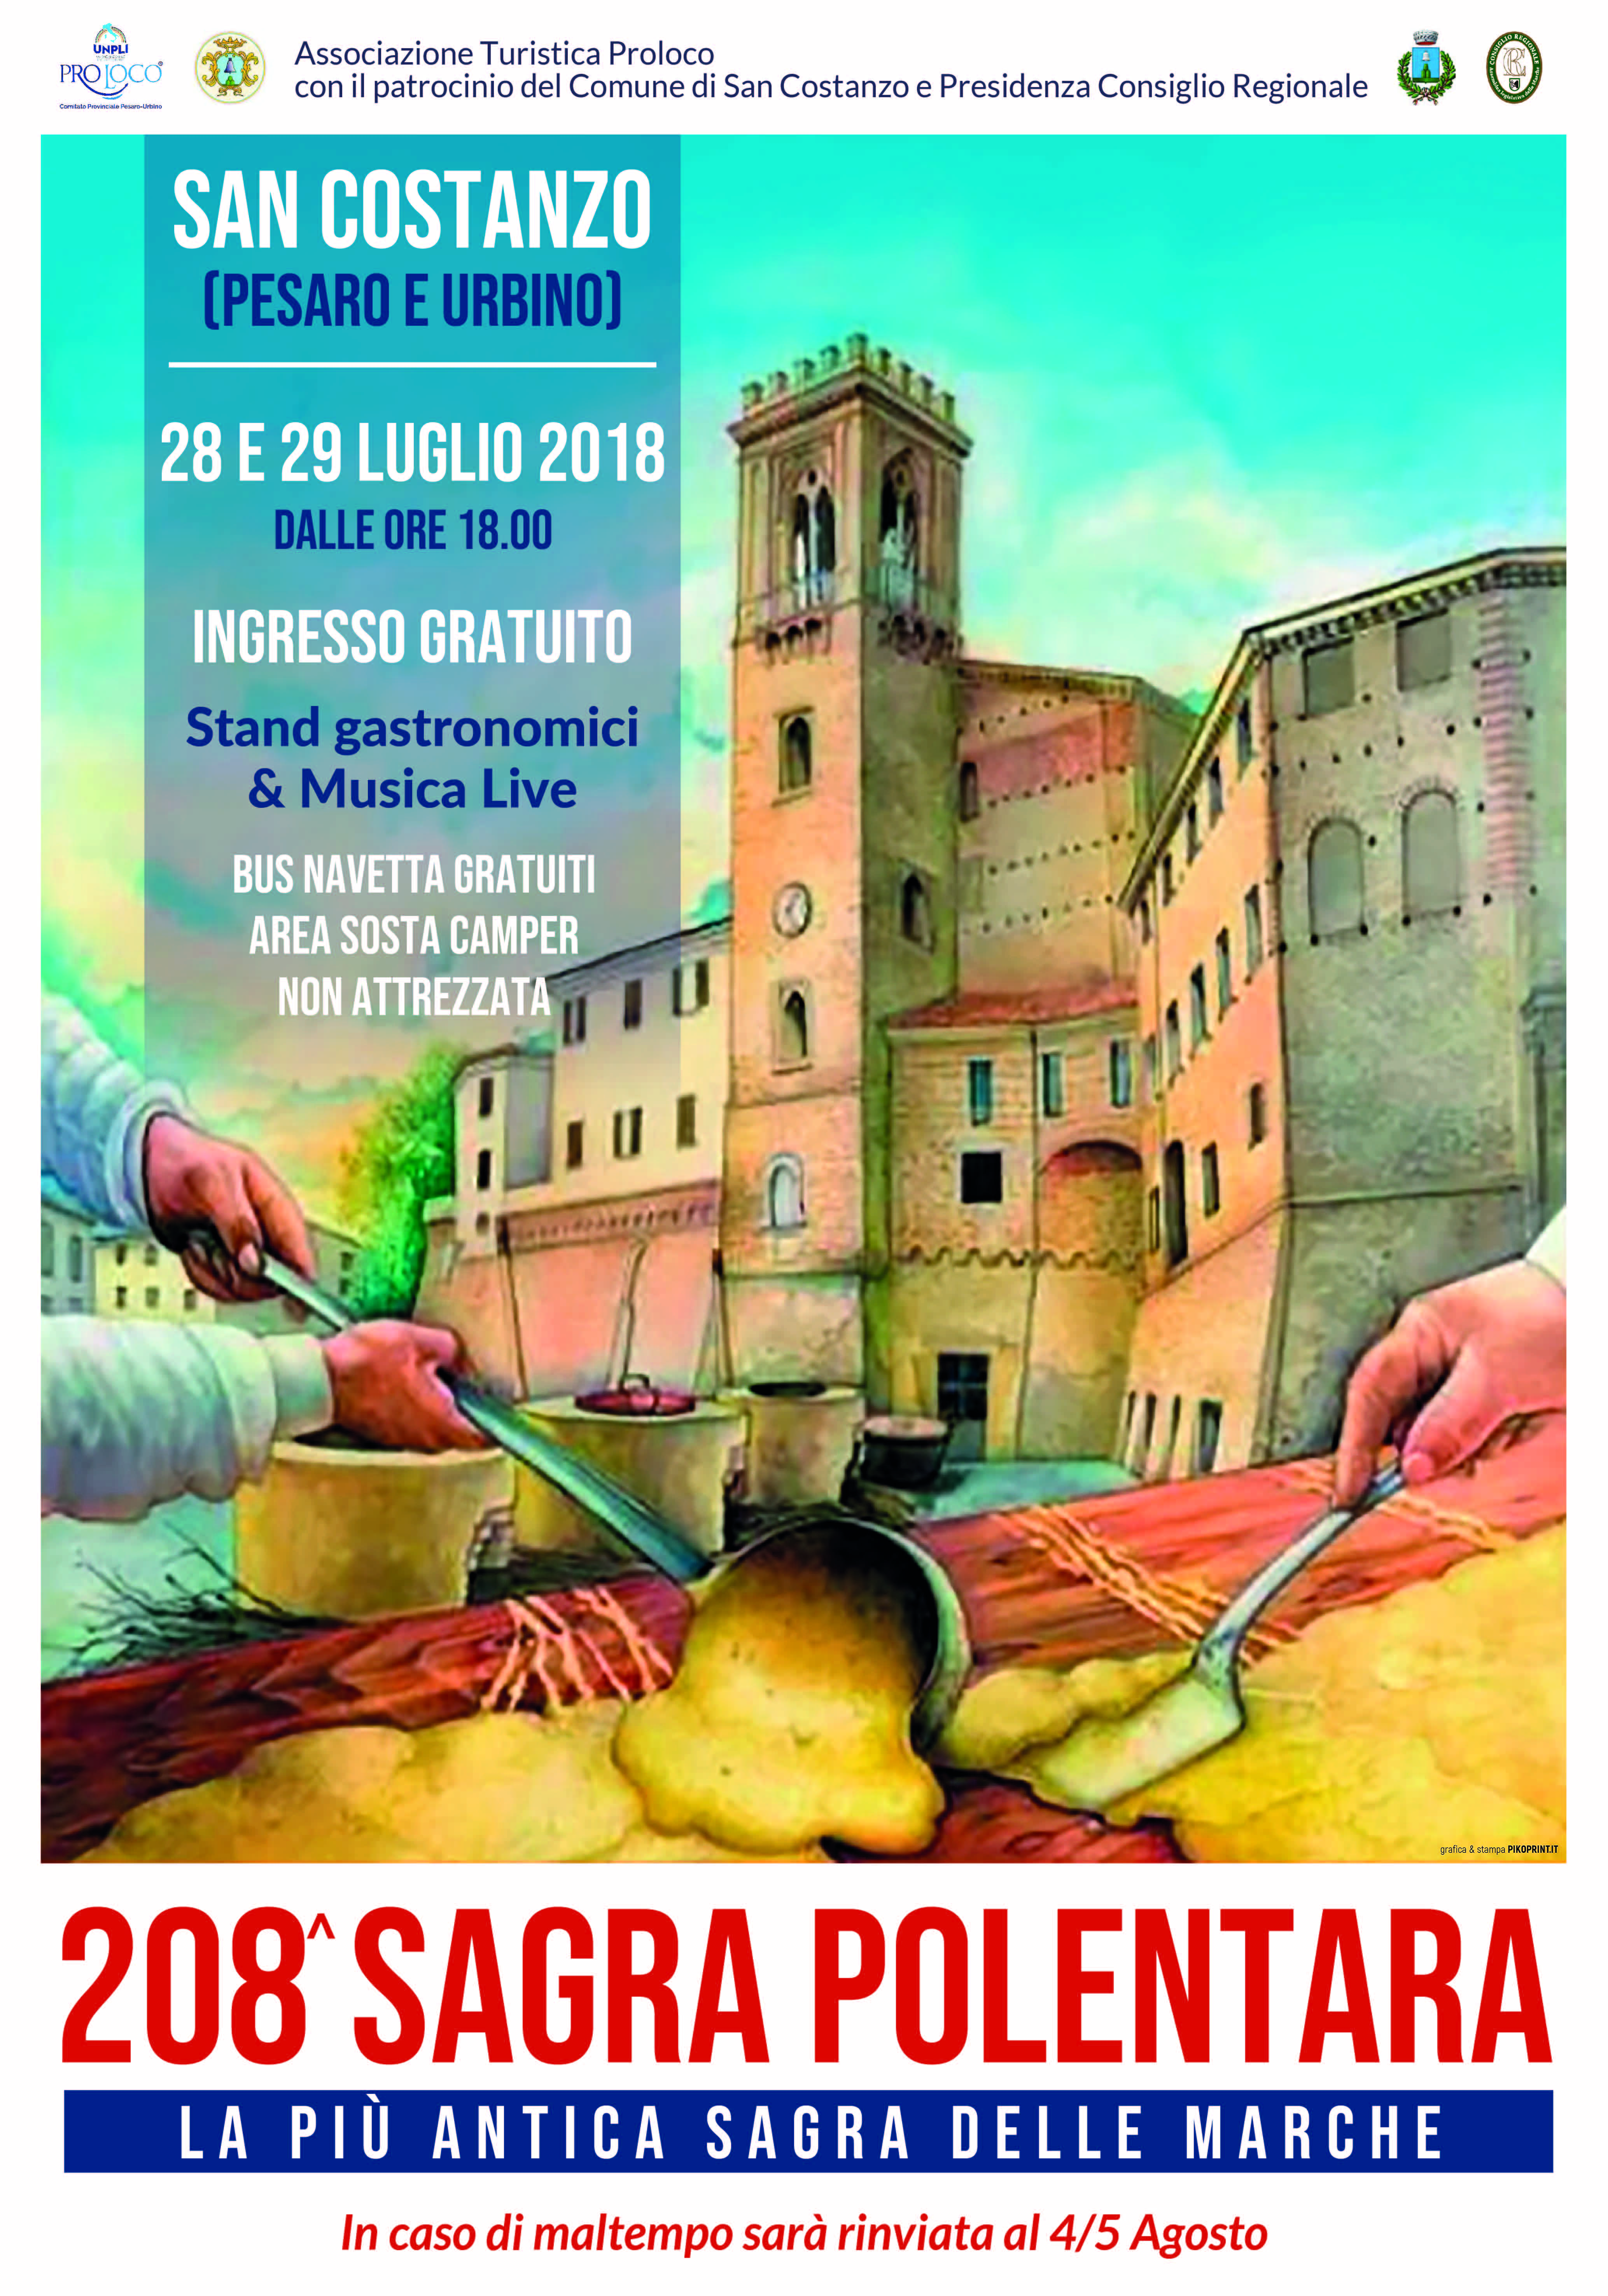 208^ Sagra Polentara – Edizione Estiva 28 & 29 luglio 2018